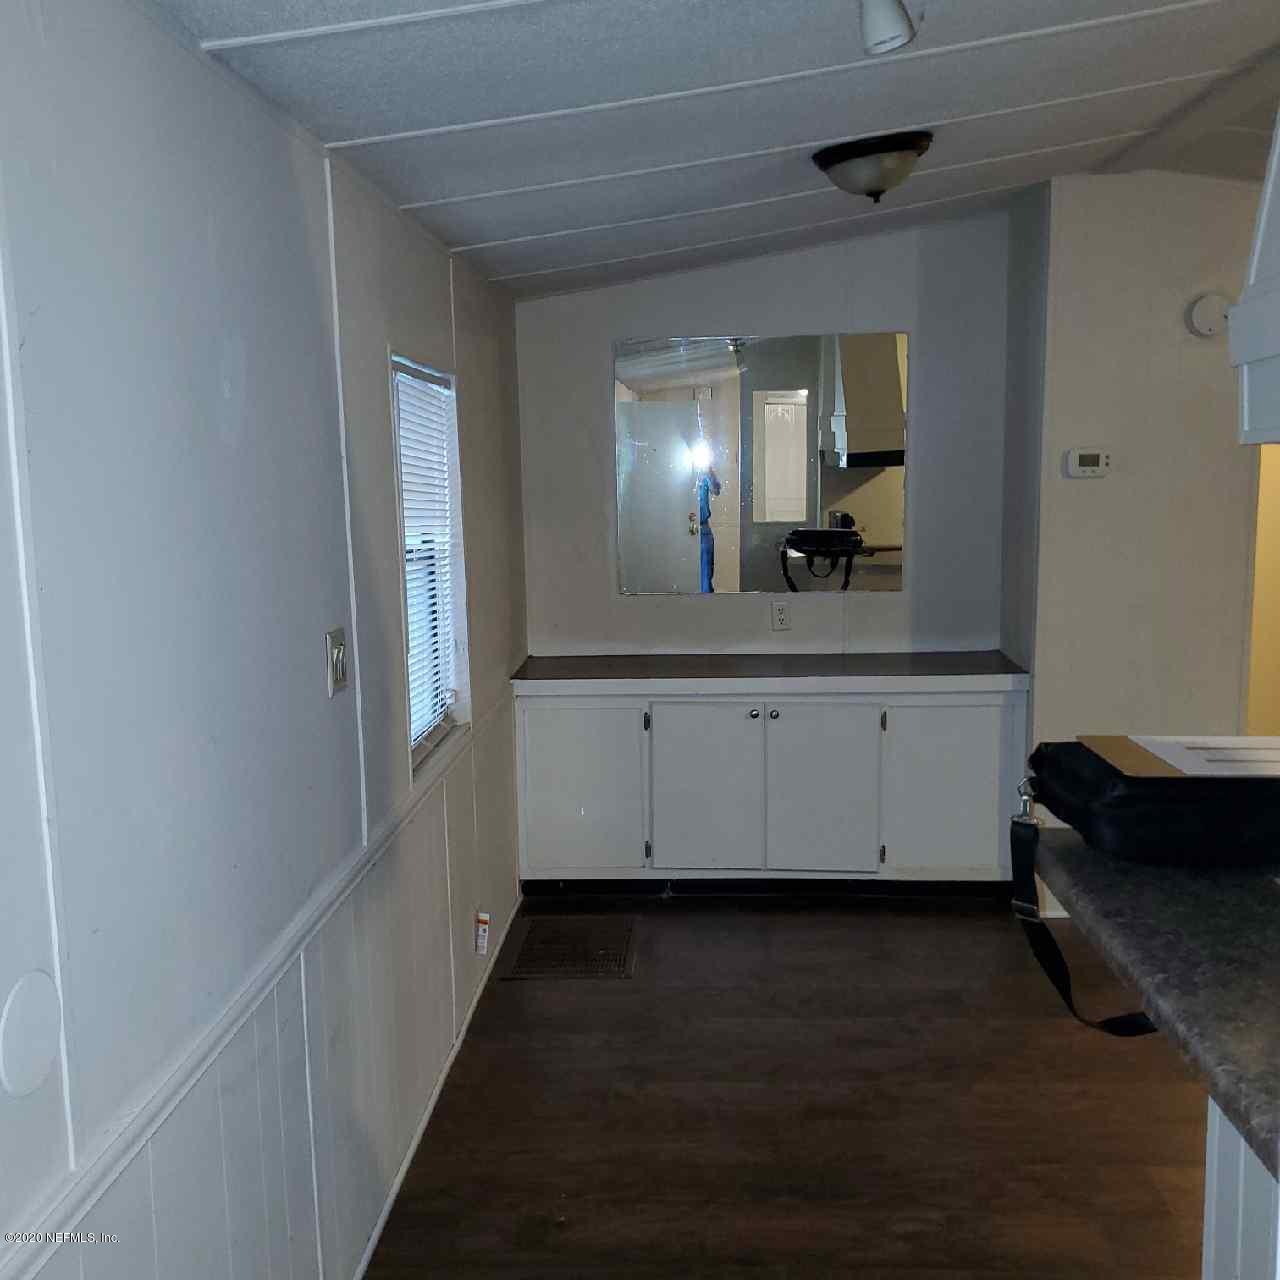 4013 TAYLOR ESTATES, JACKSONVILLE, FLORIDA 32220, 2 Bedrooms Bedrooms, ,2 BathroomsBathrooms,Rental,For Rent,TAYLOR ESTATES,1080551